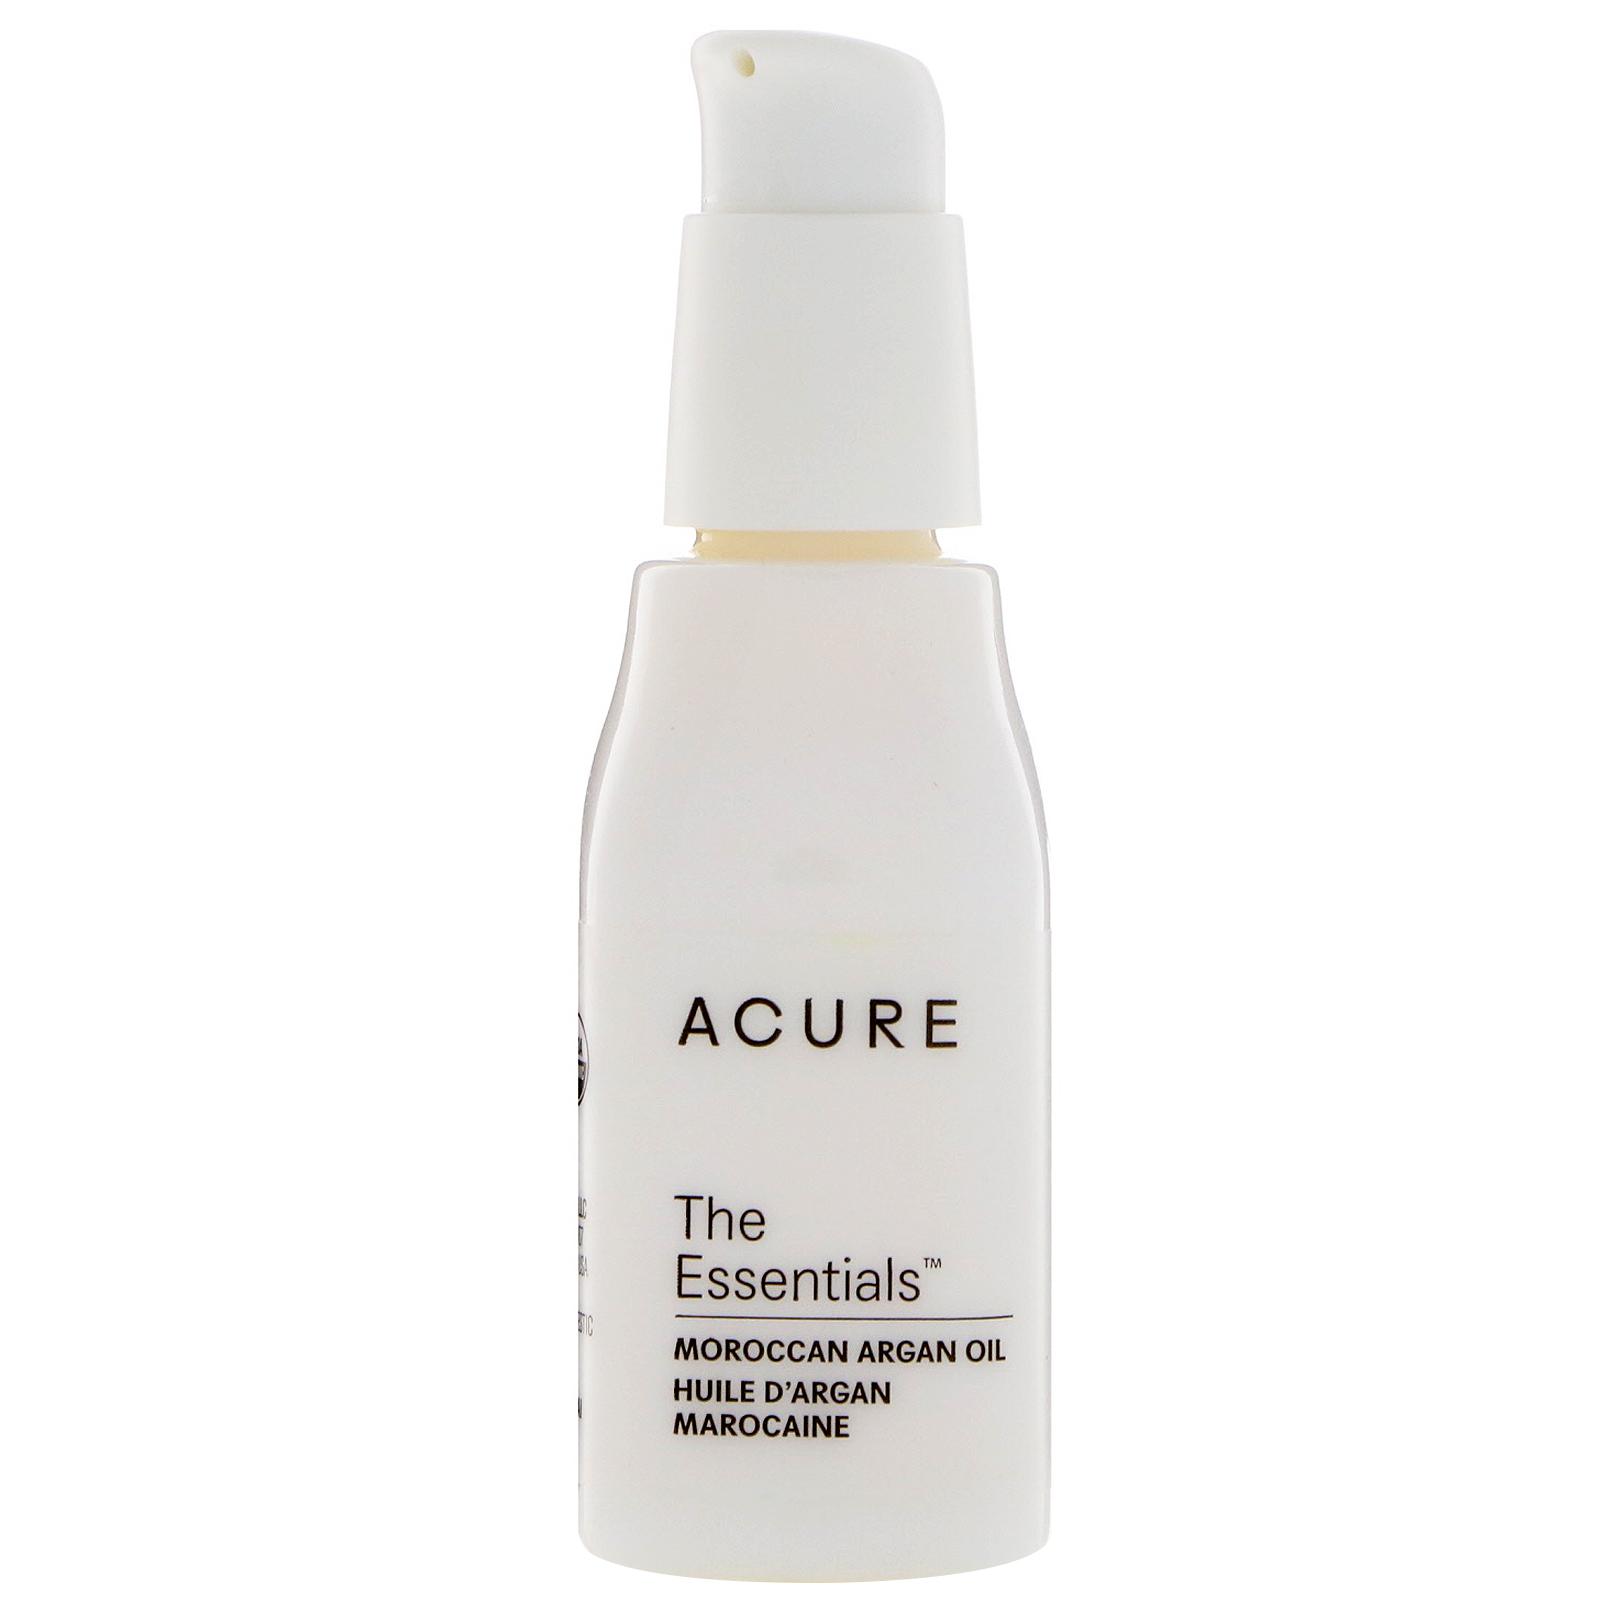 Acure Organics, The Essentials, Moroccan Argan Oil, 1 Fl